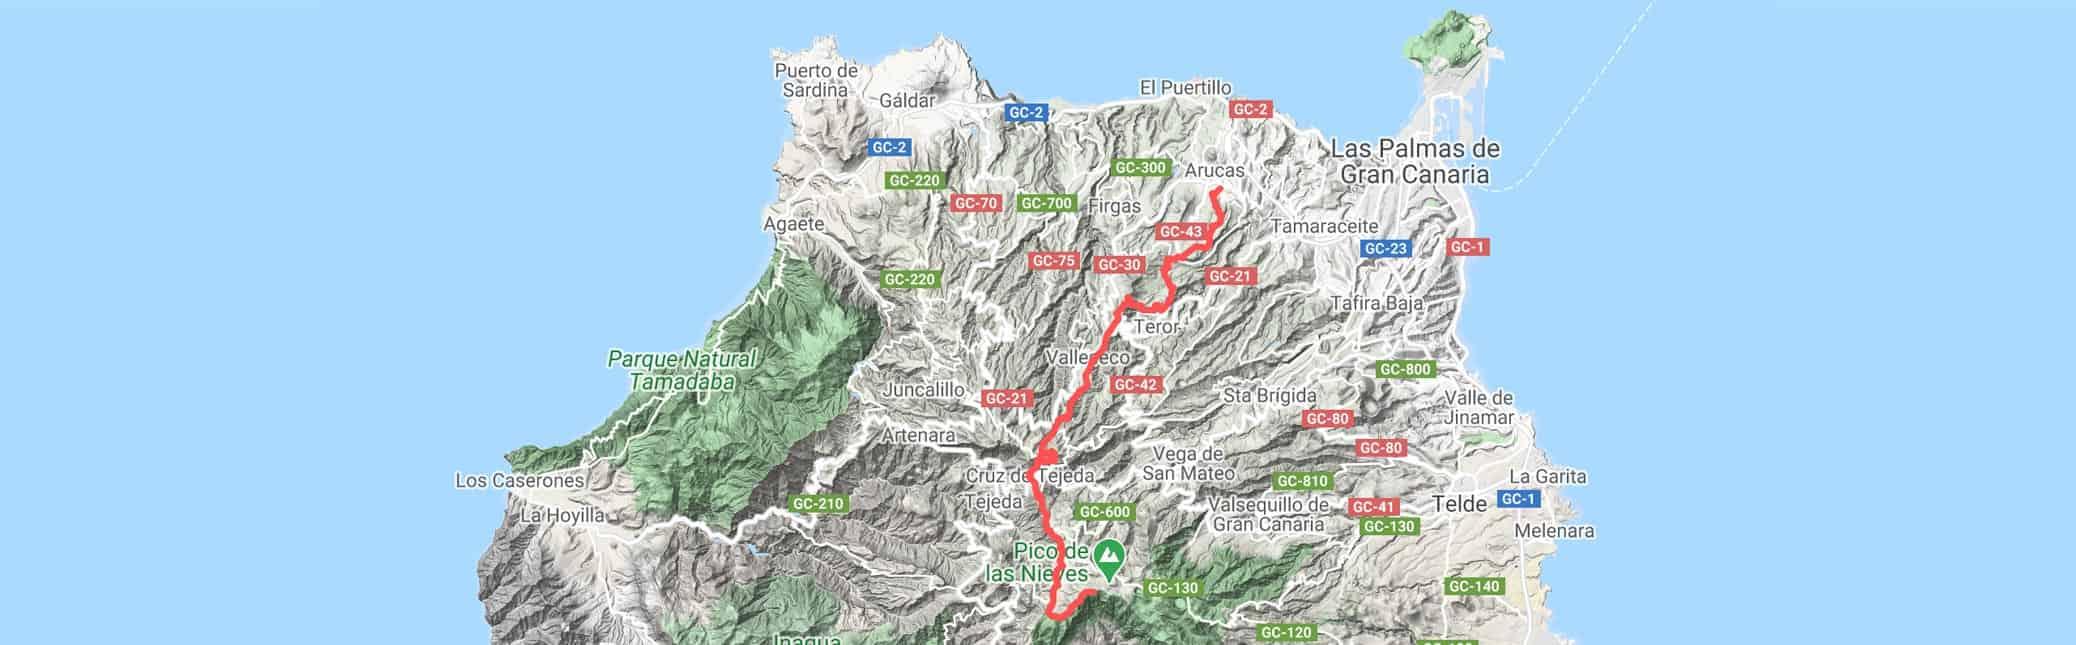 Gran Canaria Enduro - Green Nirvana track